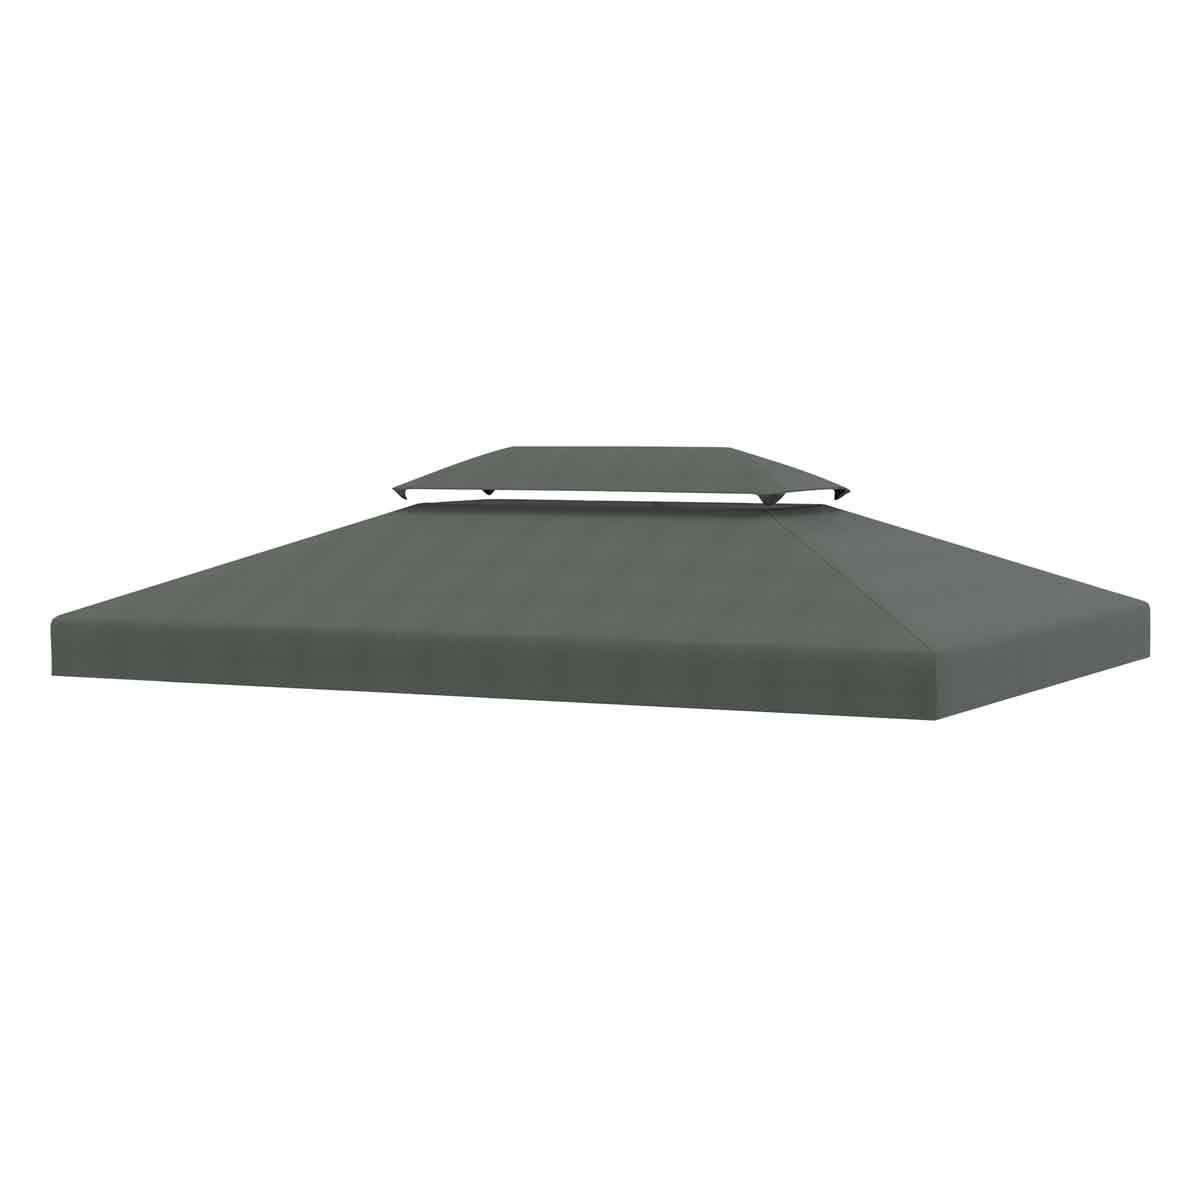 Outsunny 3x4m Replacement Gazebo Canopy - Deep Grey